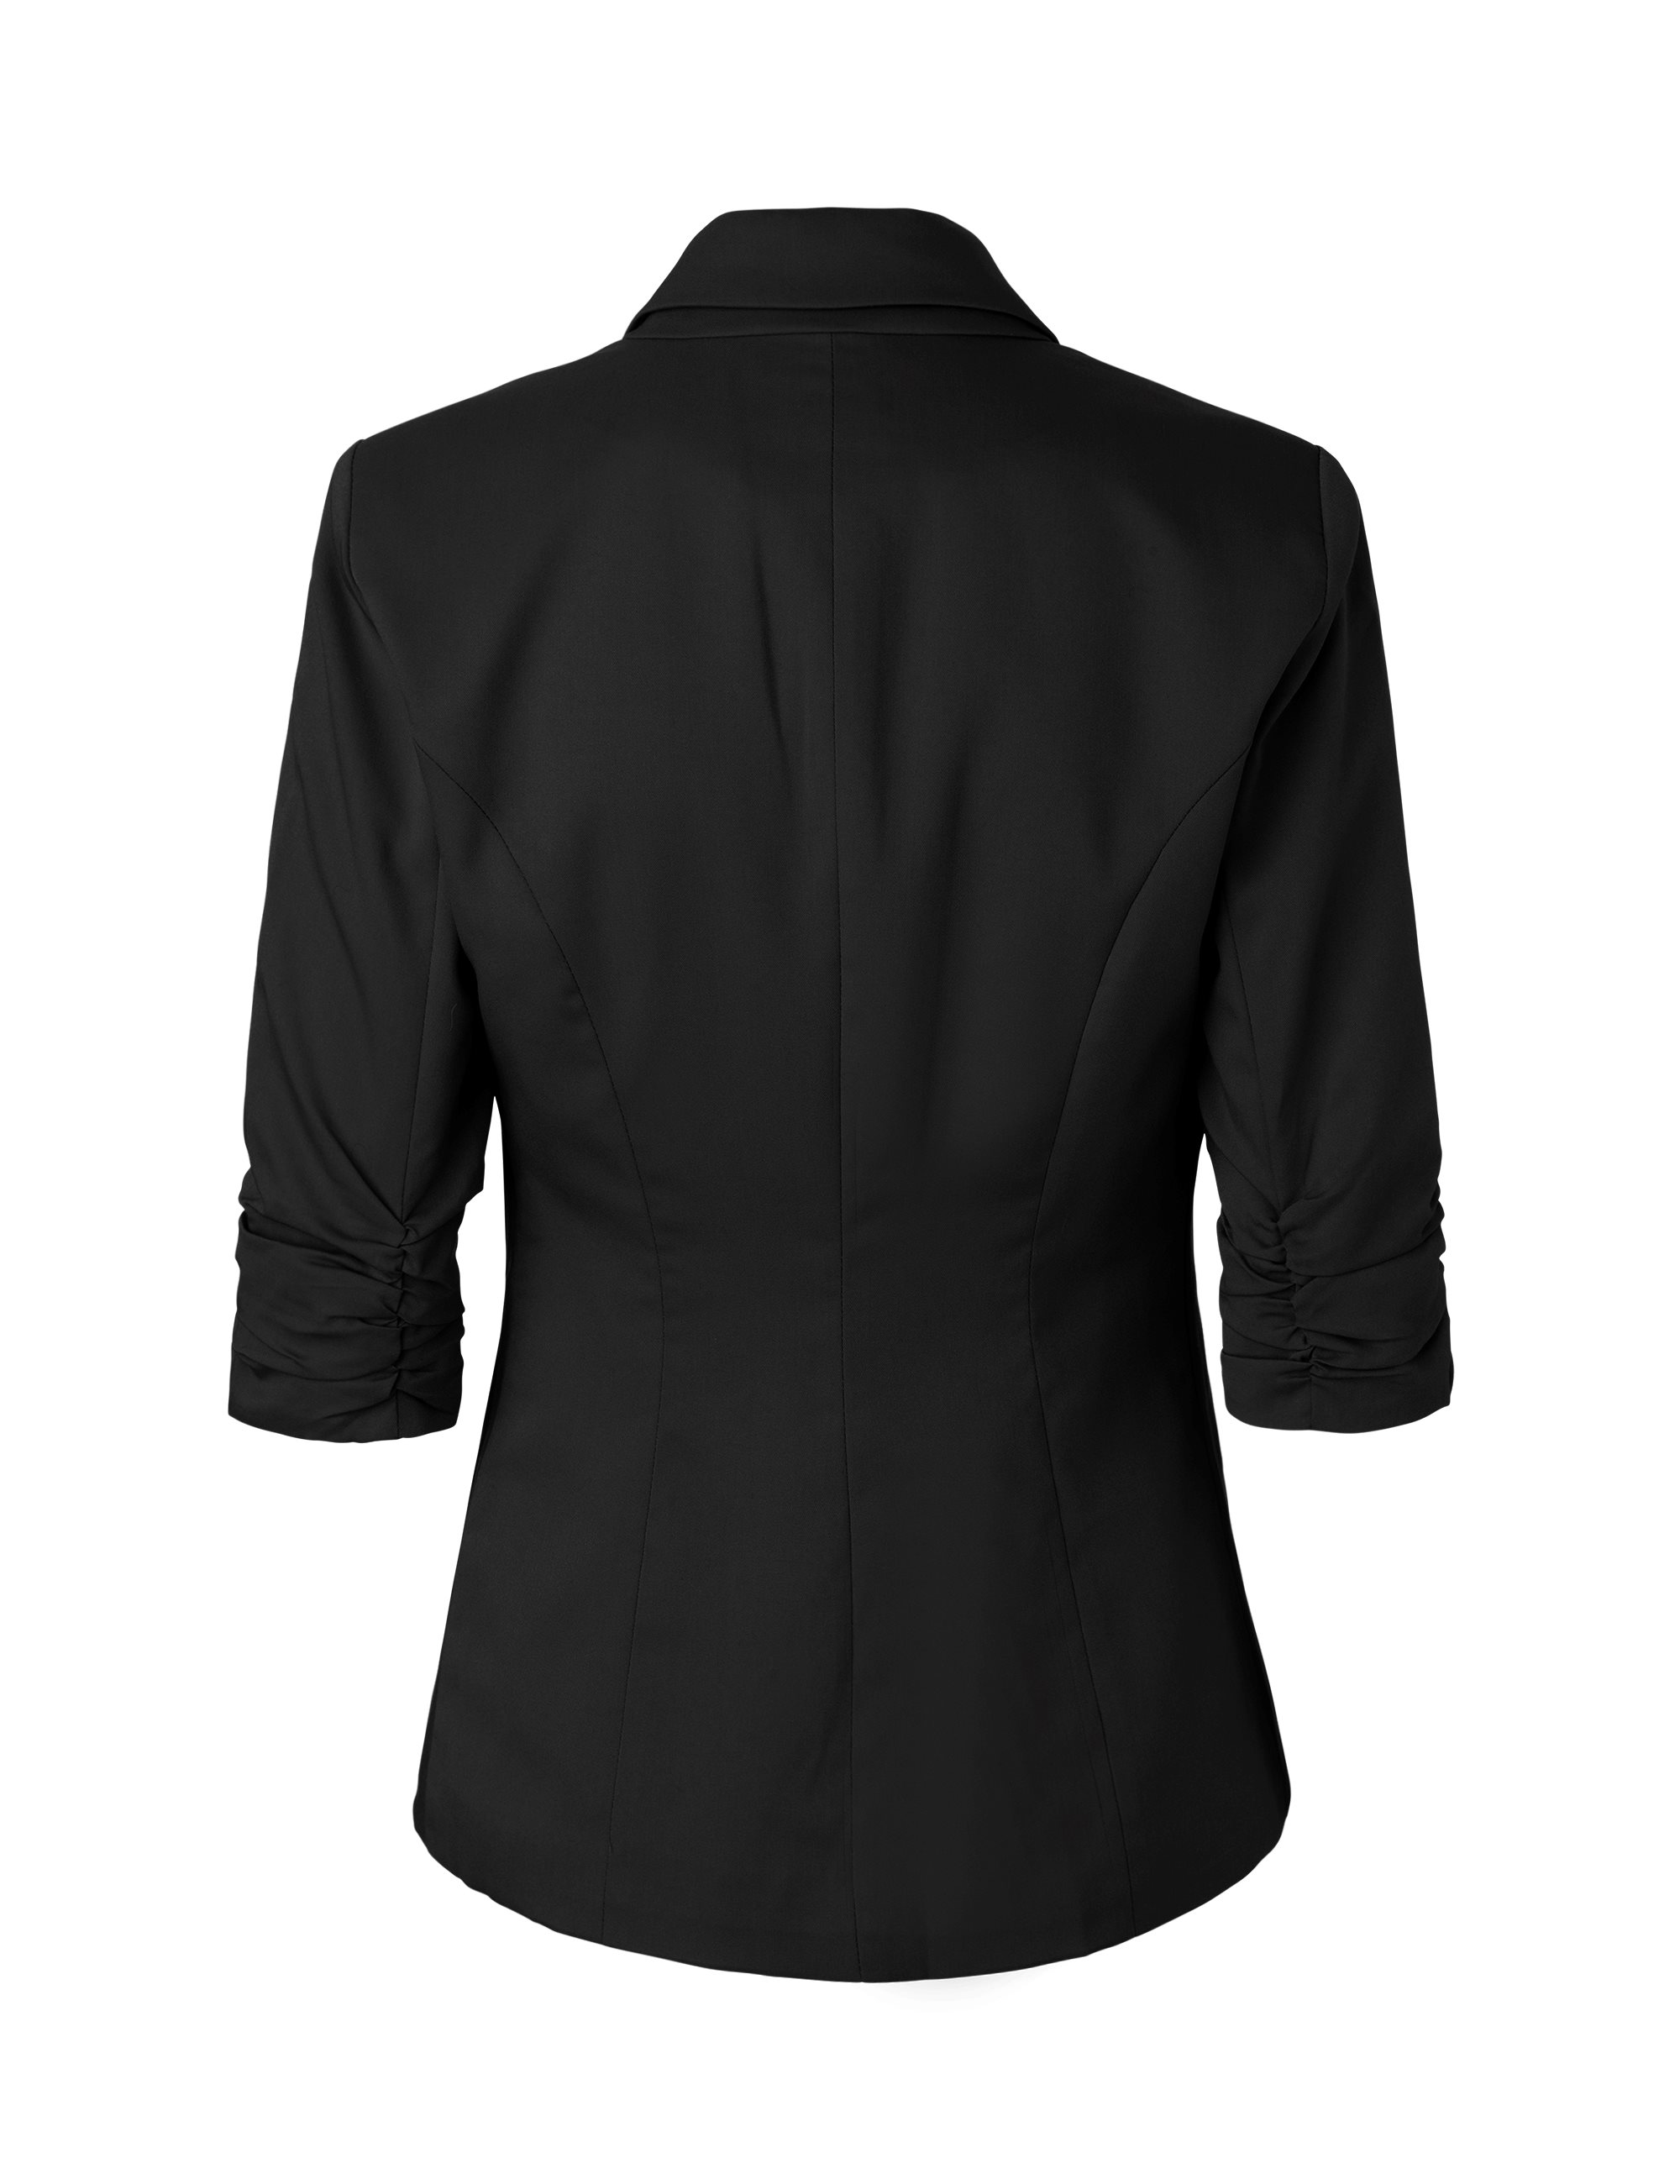 0bd22050161 mbyM Blazers | Women's Jackets & Coats | mbyM Outerwear